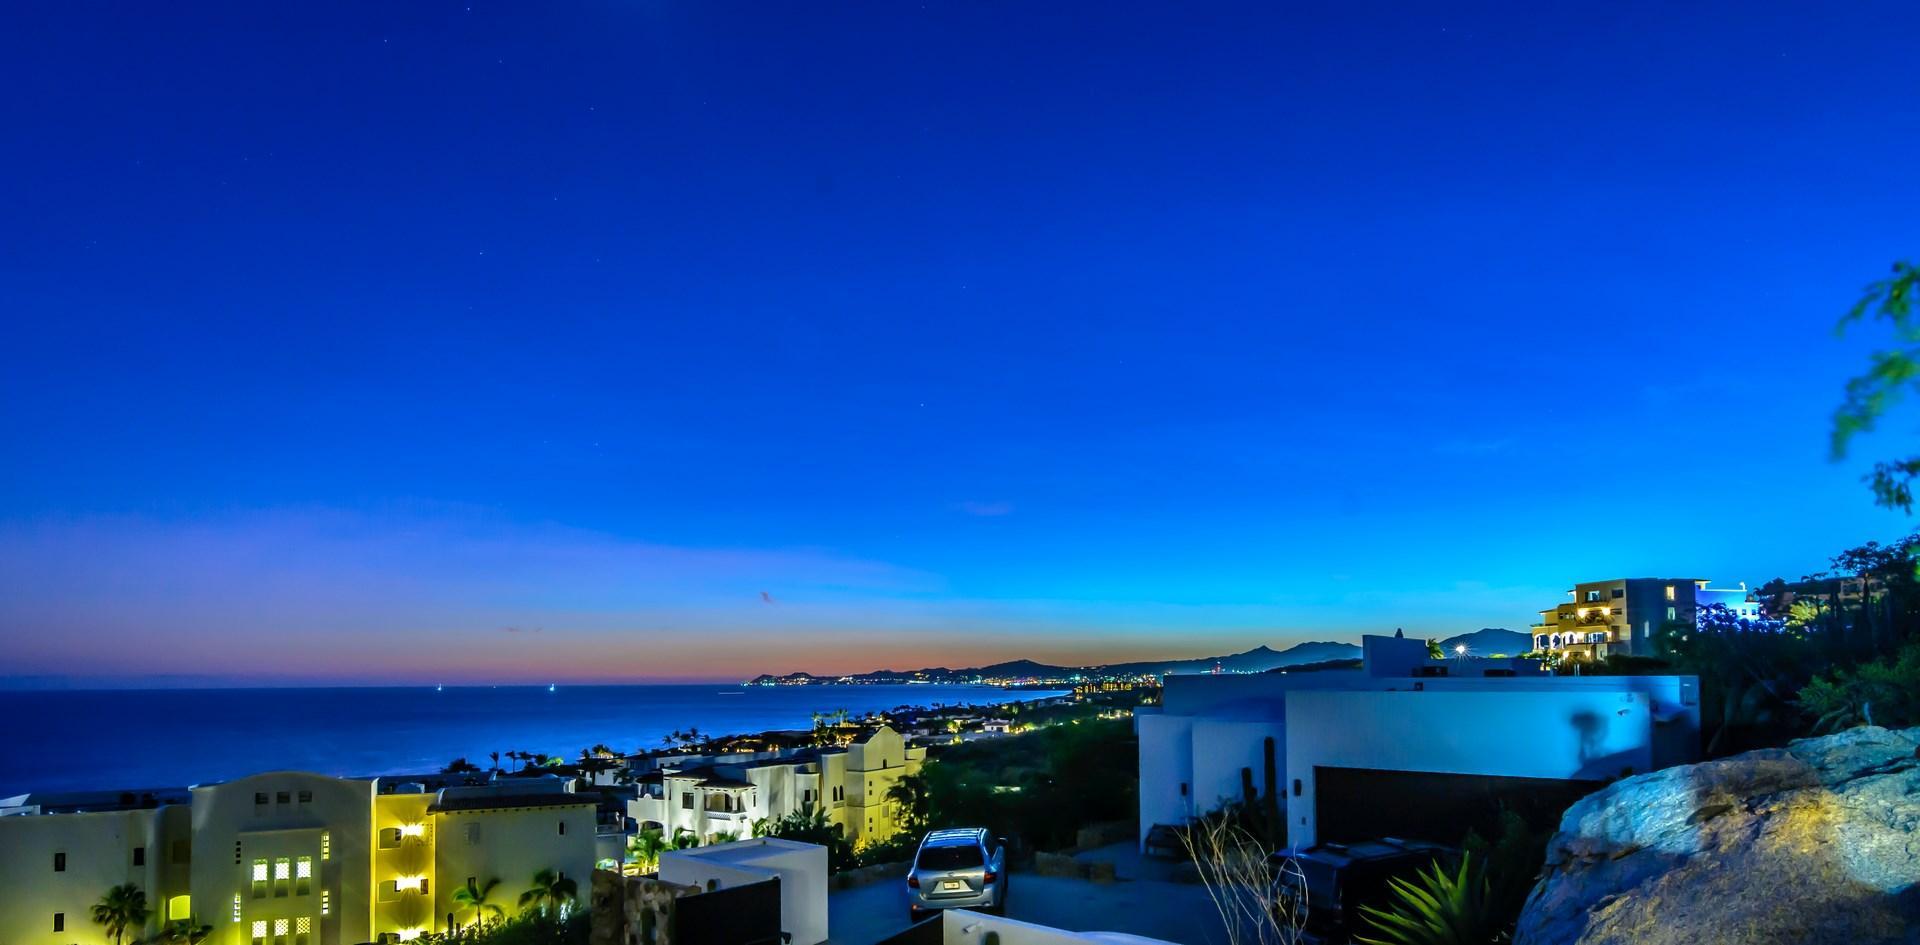 Sunset at Casa Laguna Linda